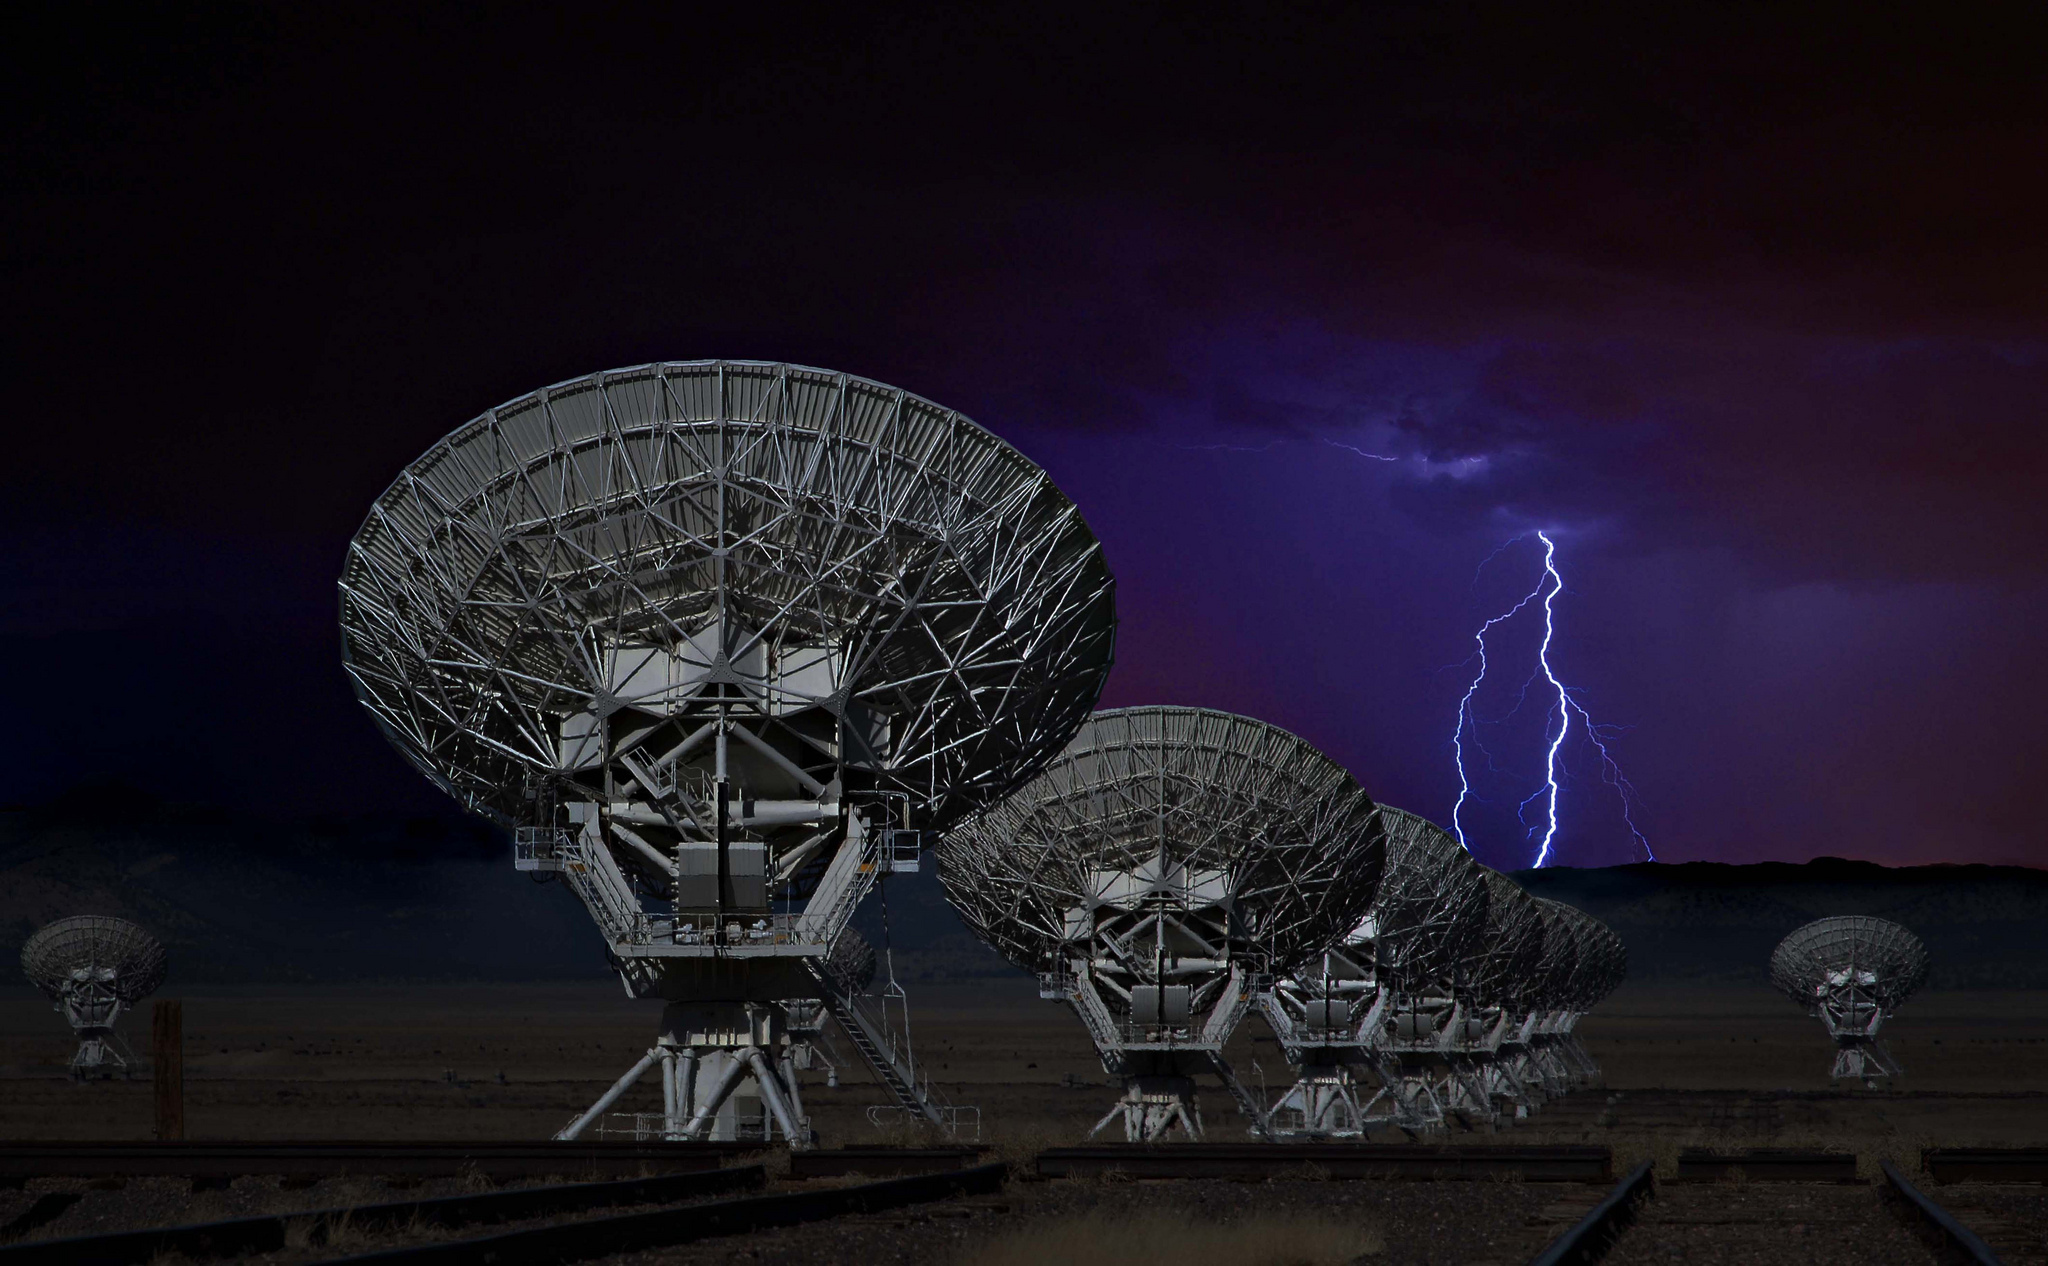 New mexico the sky lightning technology antenna the radio 2048x1266